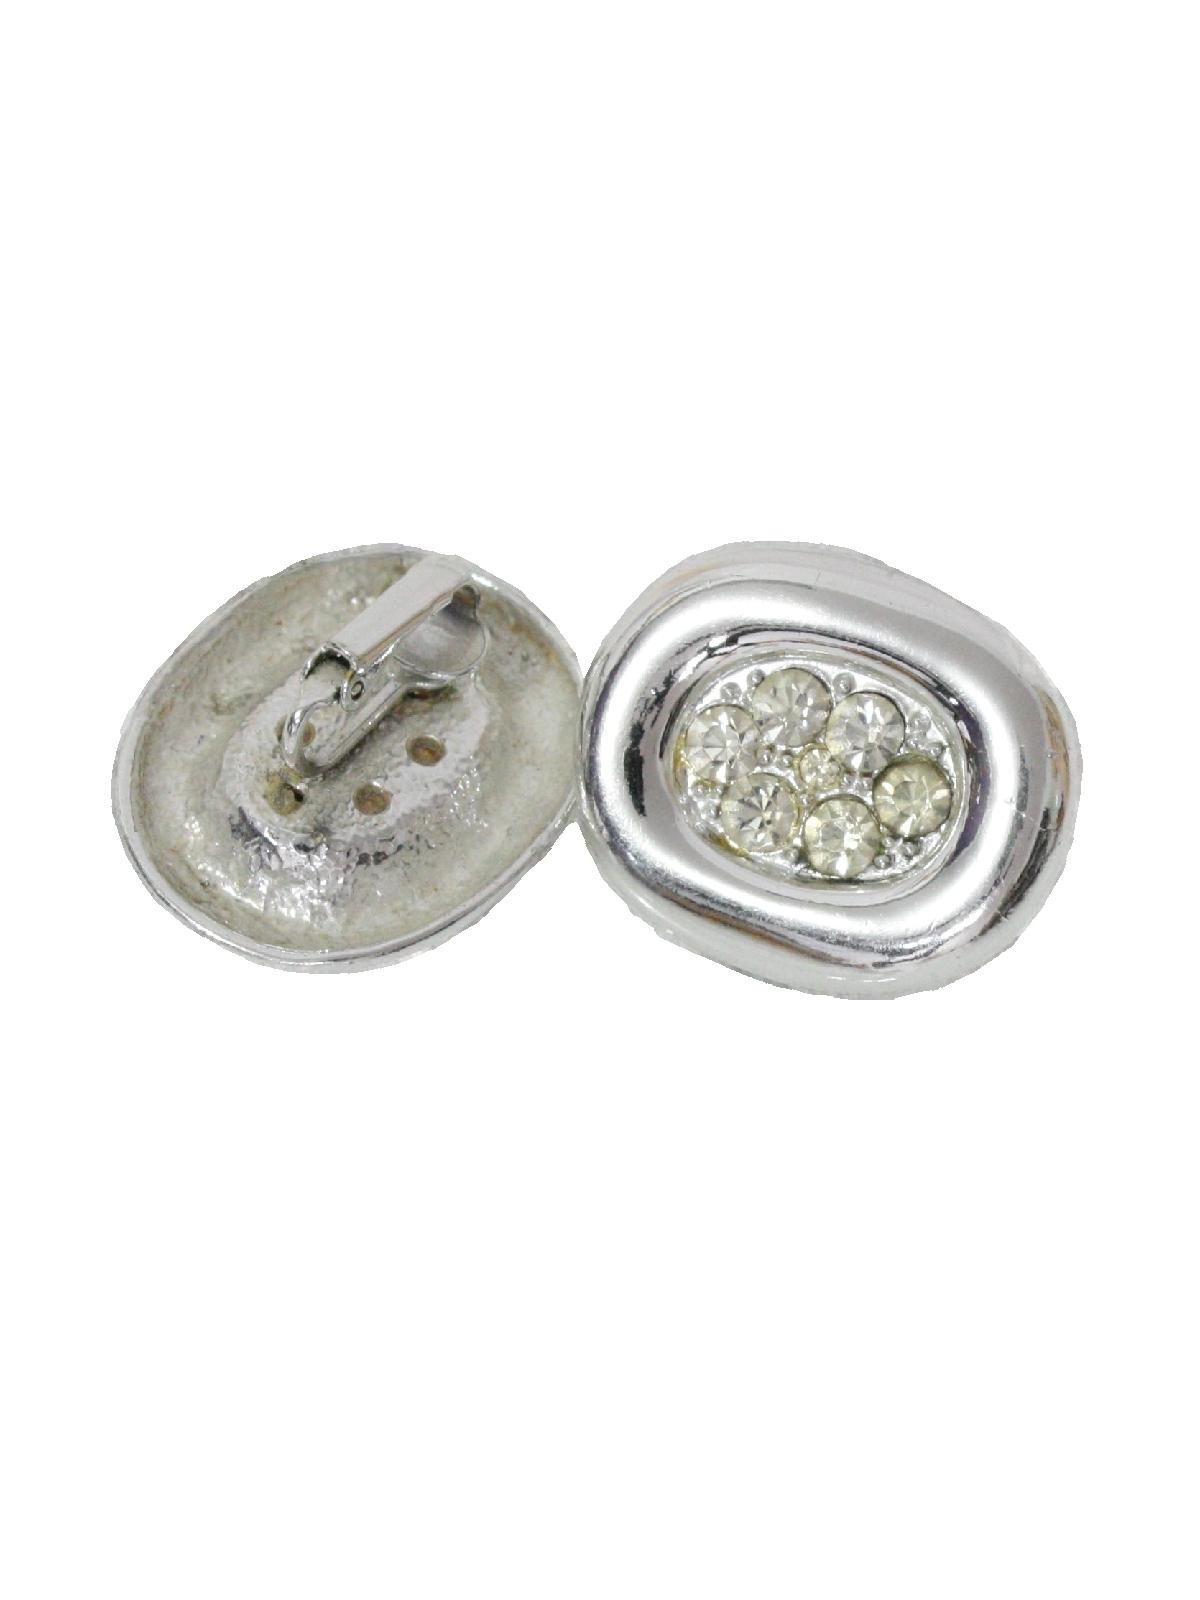 29cdeccf1 Vintage 1960's Ring: 60s -No Label- Womens silver tone, clip ...